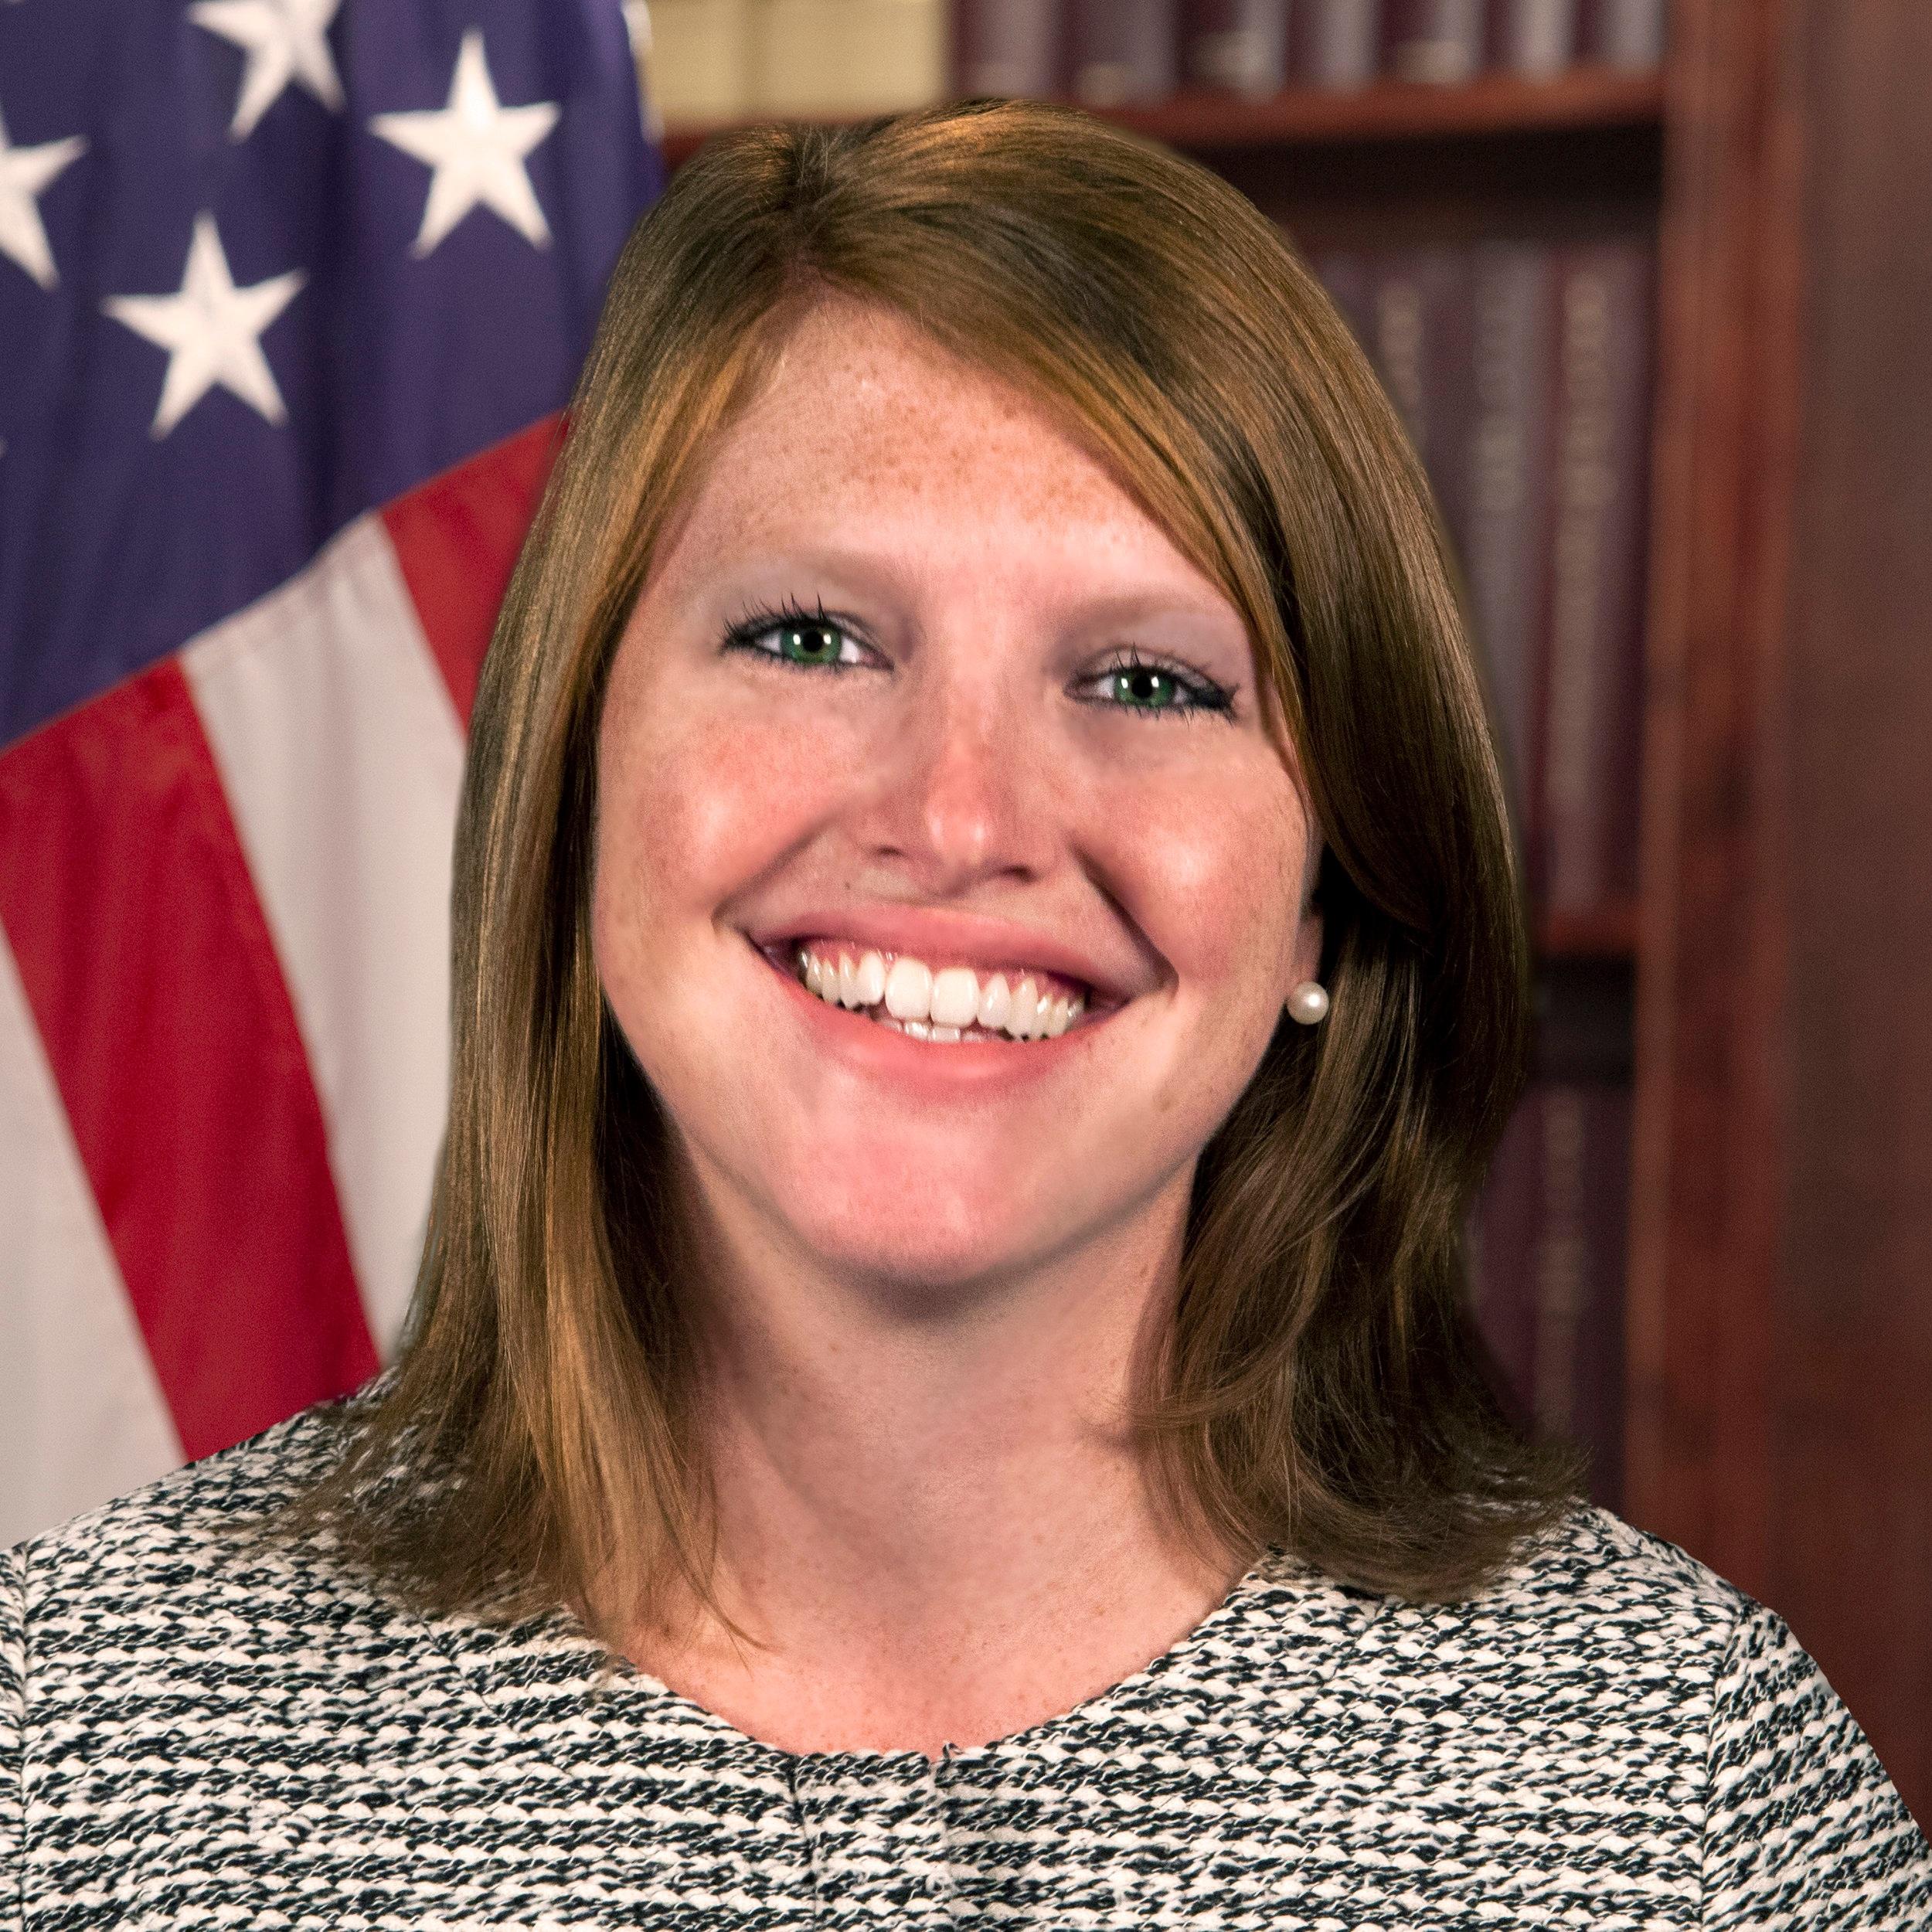 Lauren Bryan, Washington, D.C.